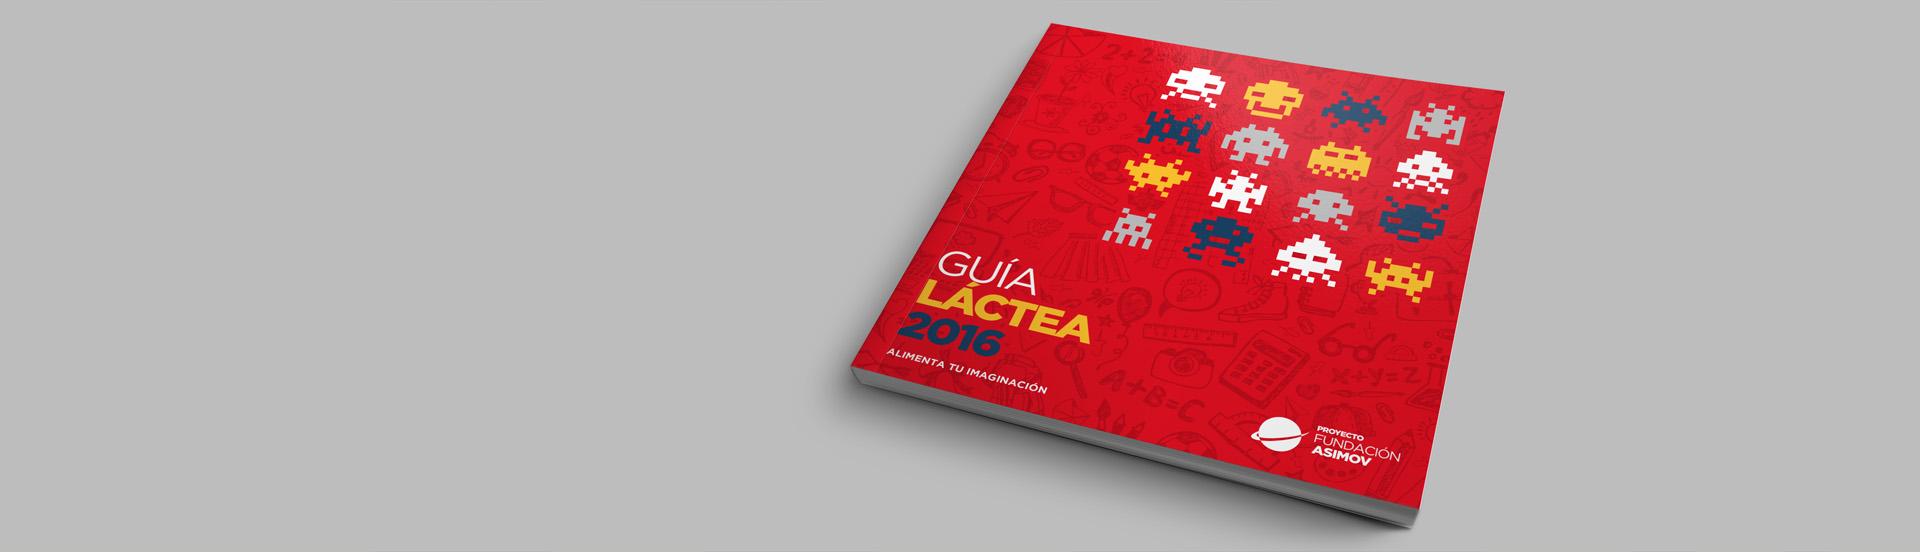 guia_slide